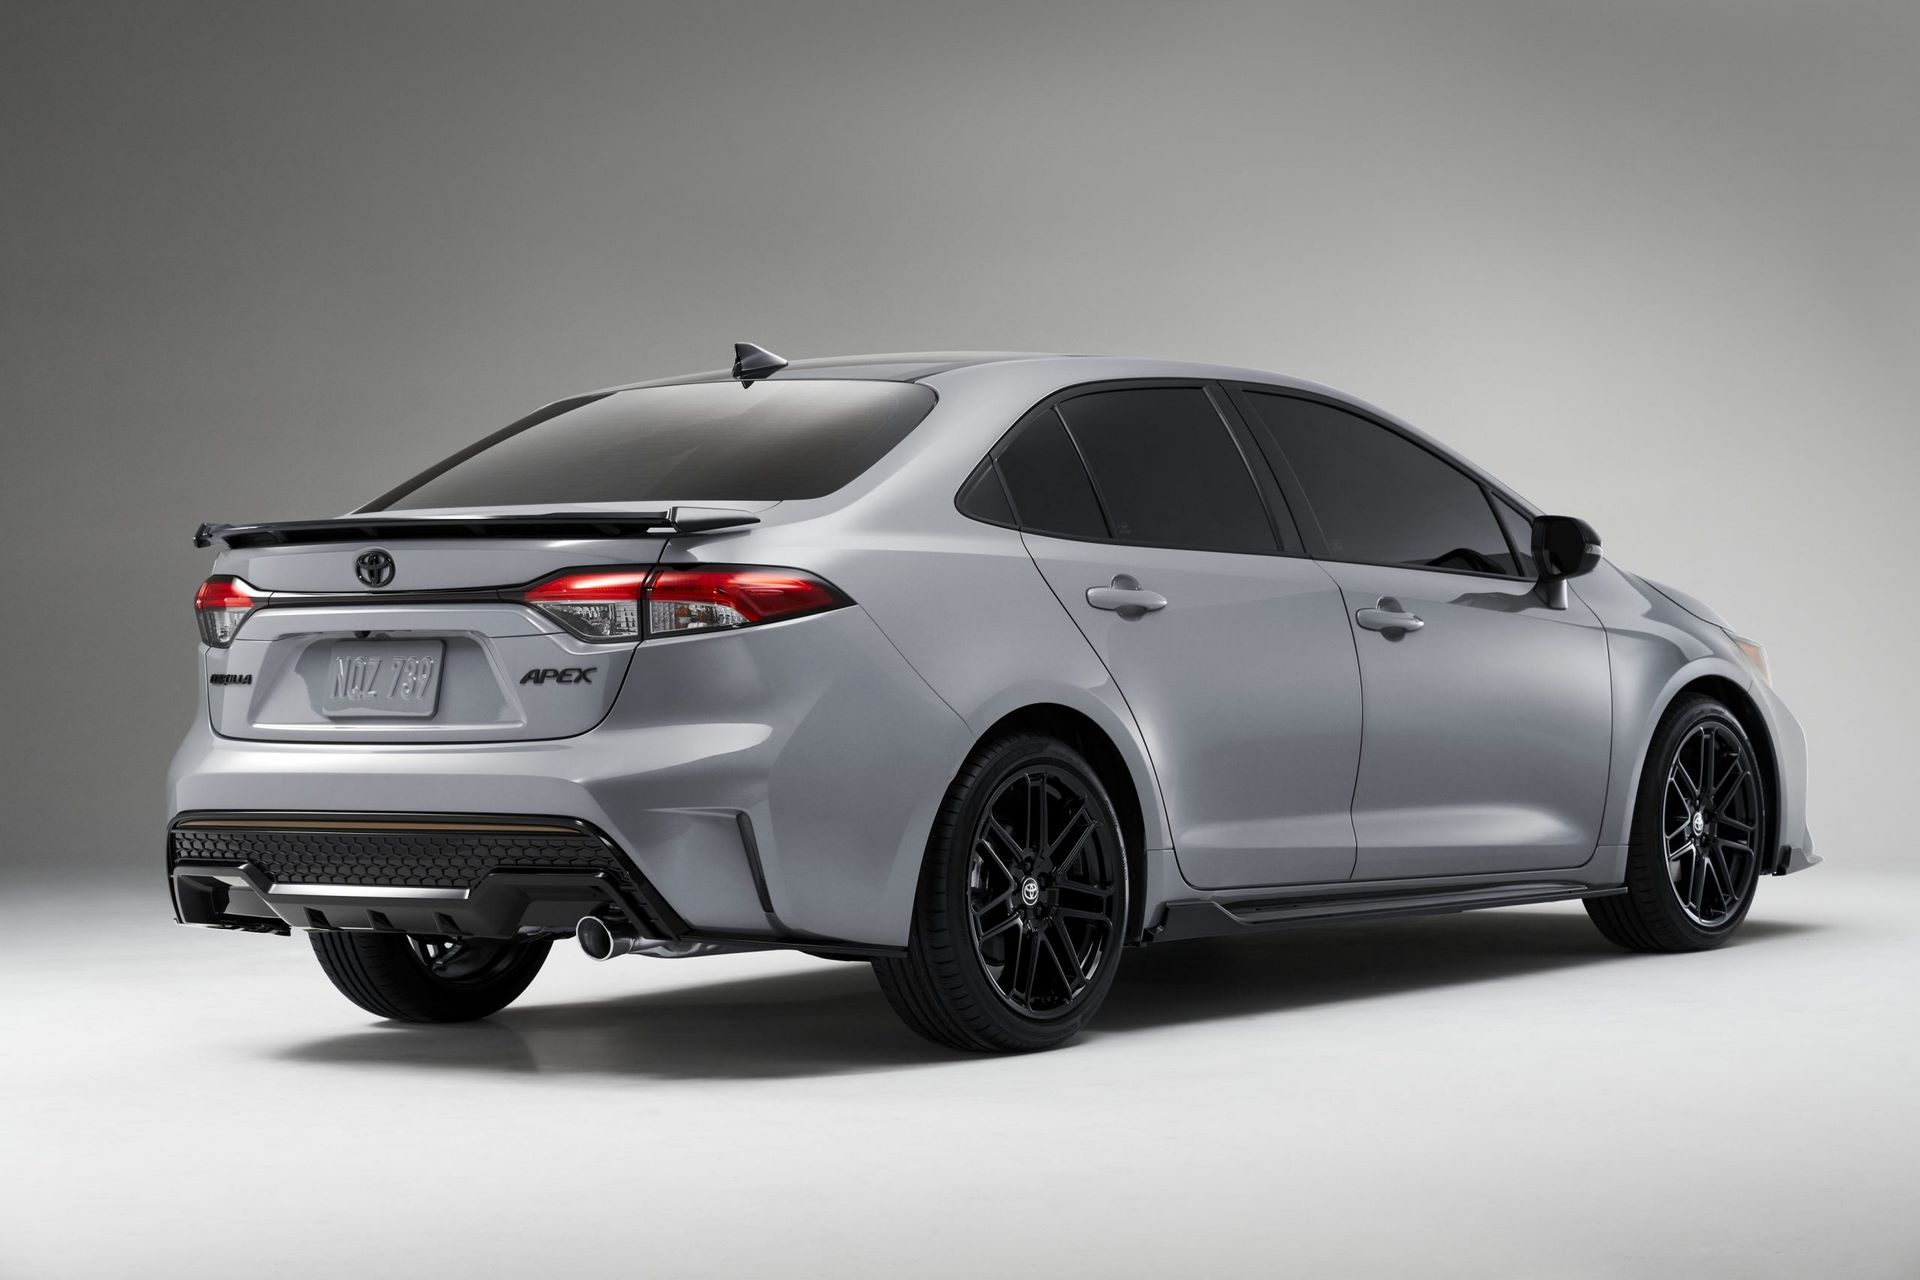 2021-Toyota-Corolla-Apex_008-scaled